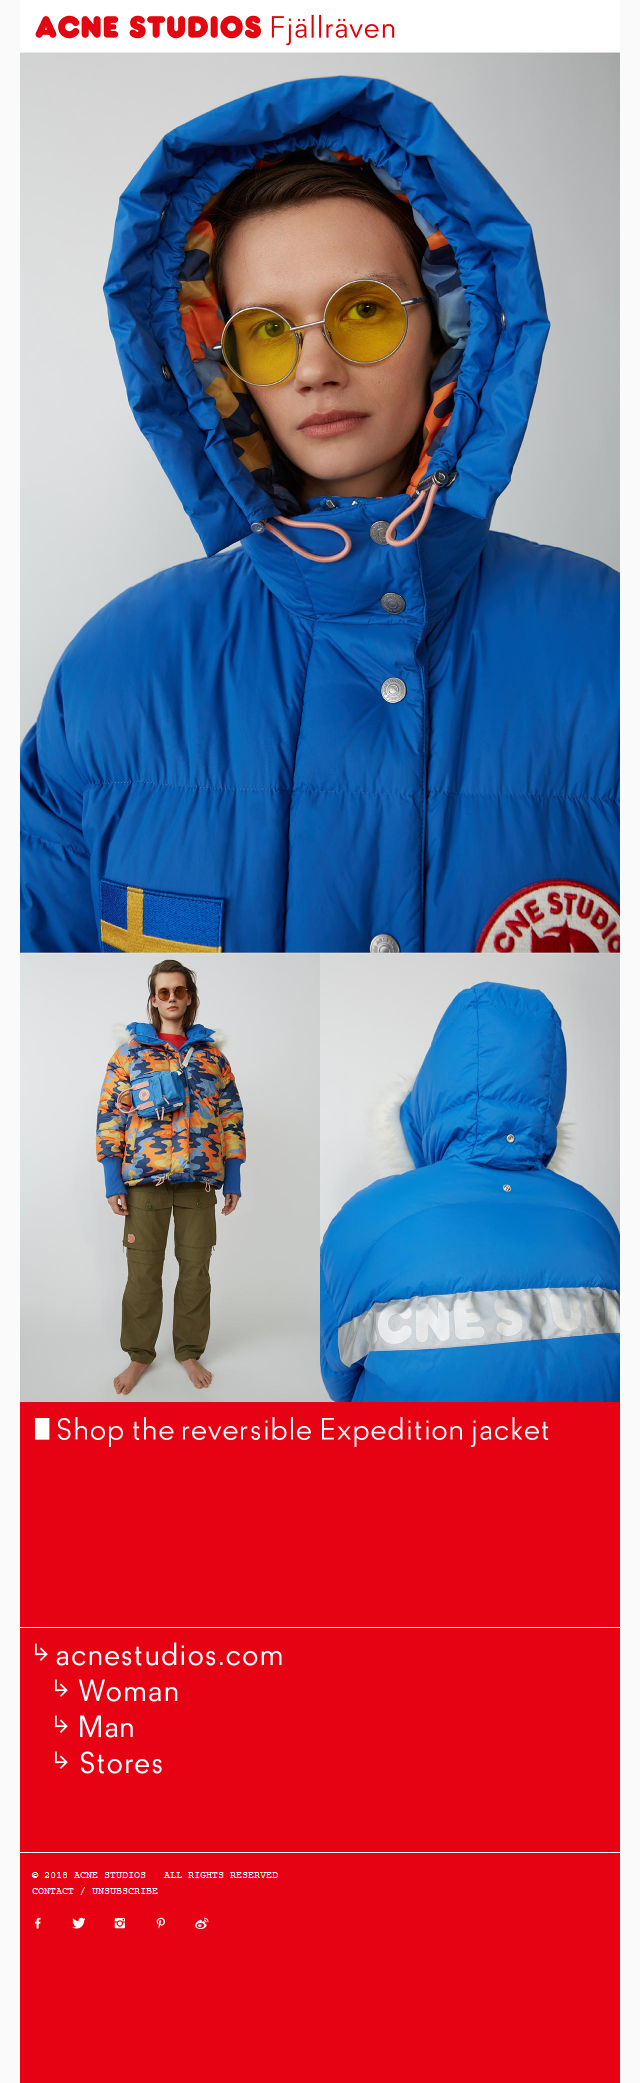 Acne Studios Fjällräven Expedition jacket